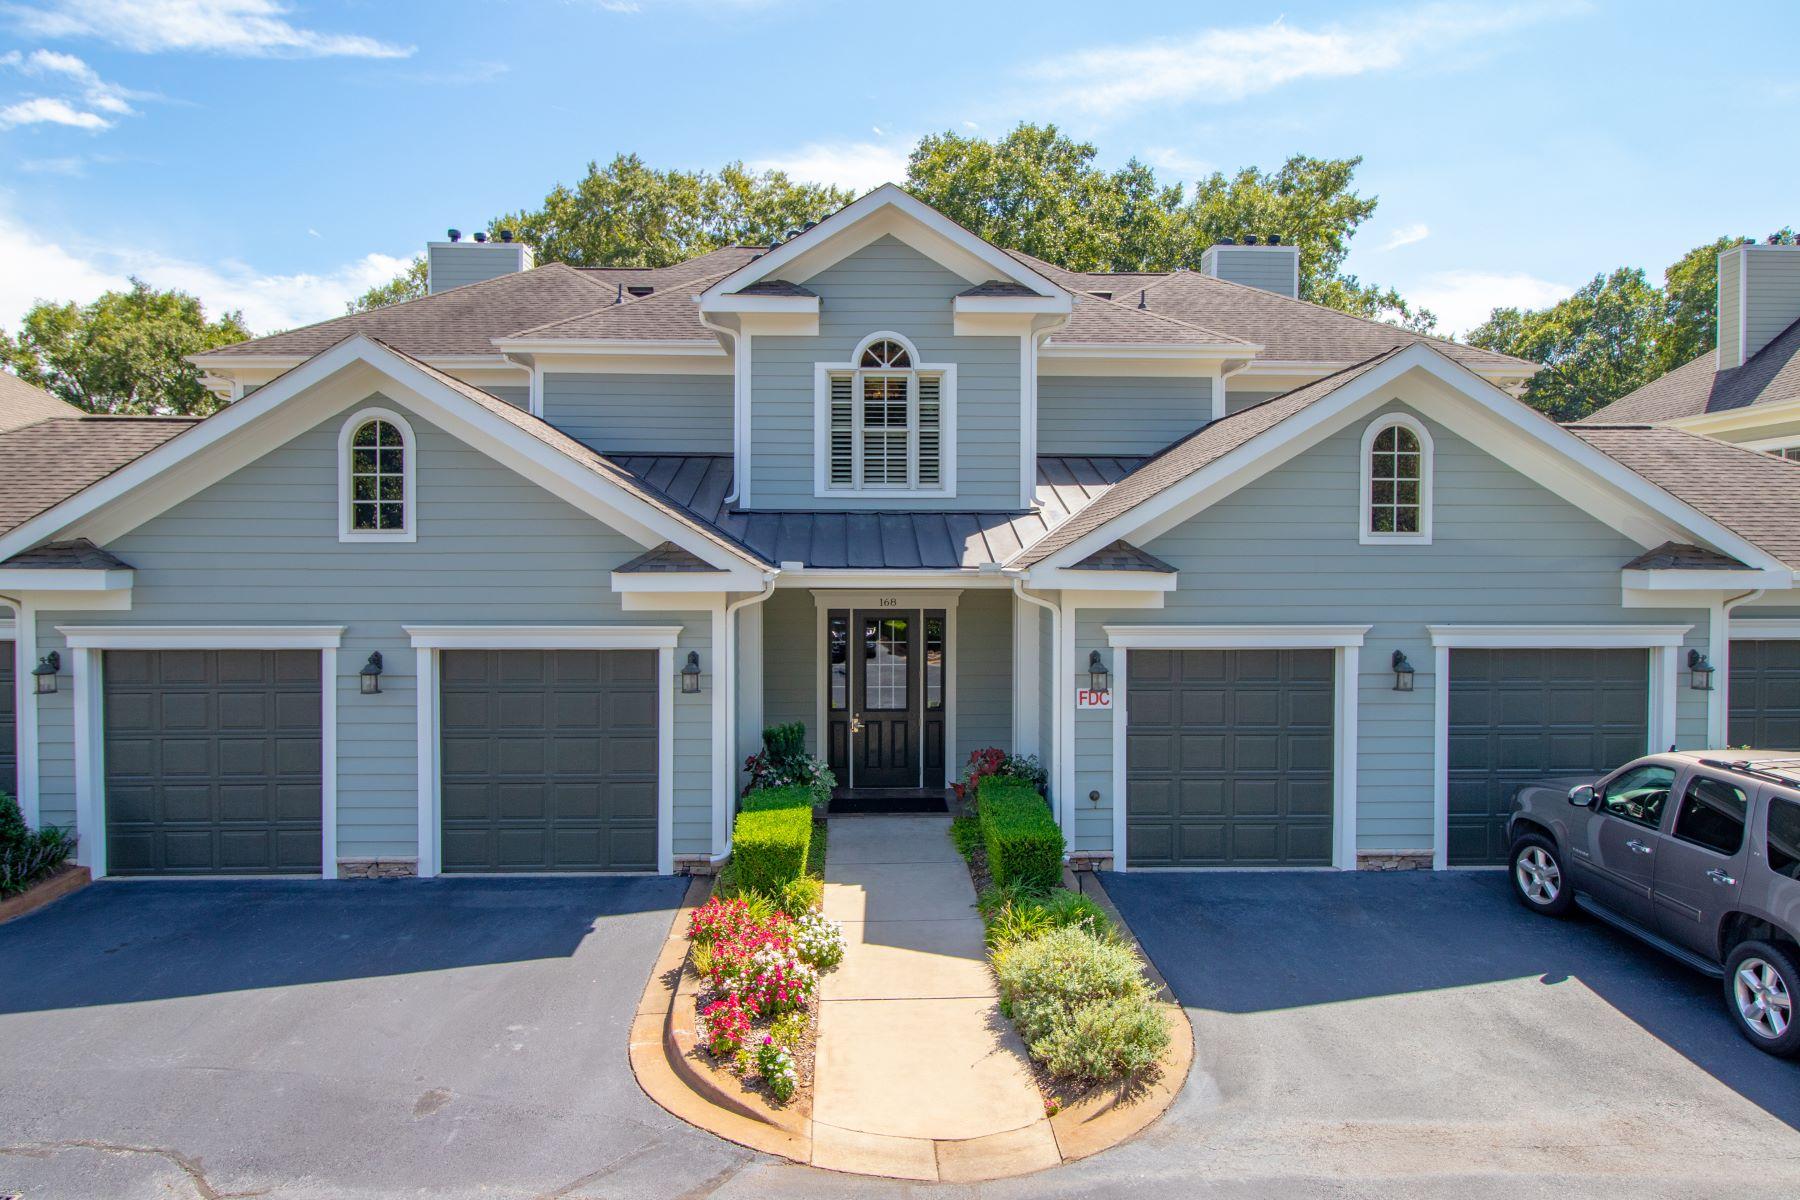 Condominiums للـ Sale في Downtown Living in a Quiet Neighborhood 168 Ridgeland Drive Bldg. 3, Unit 101, Greenville, South Carolina 29601 United States